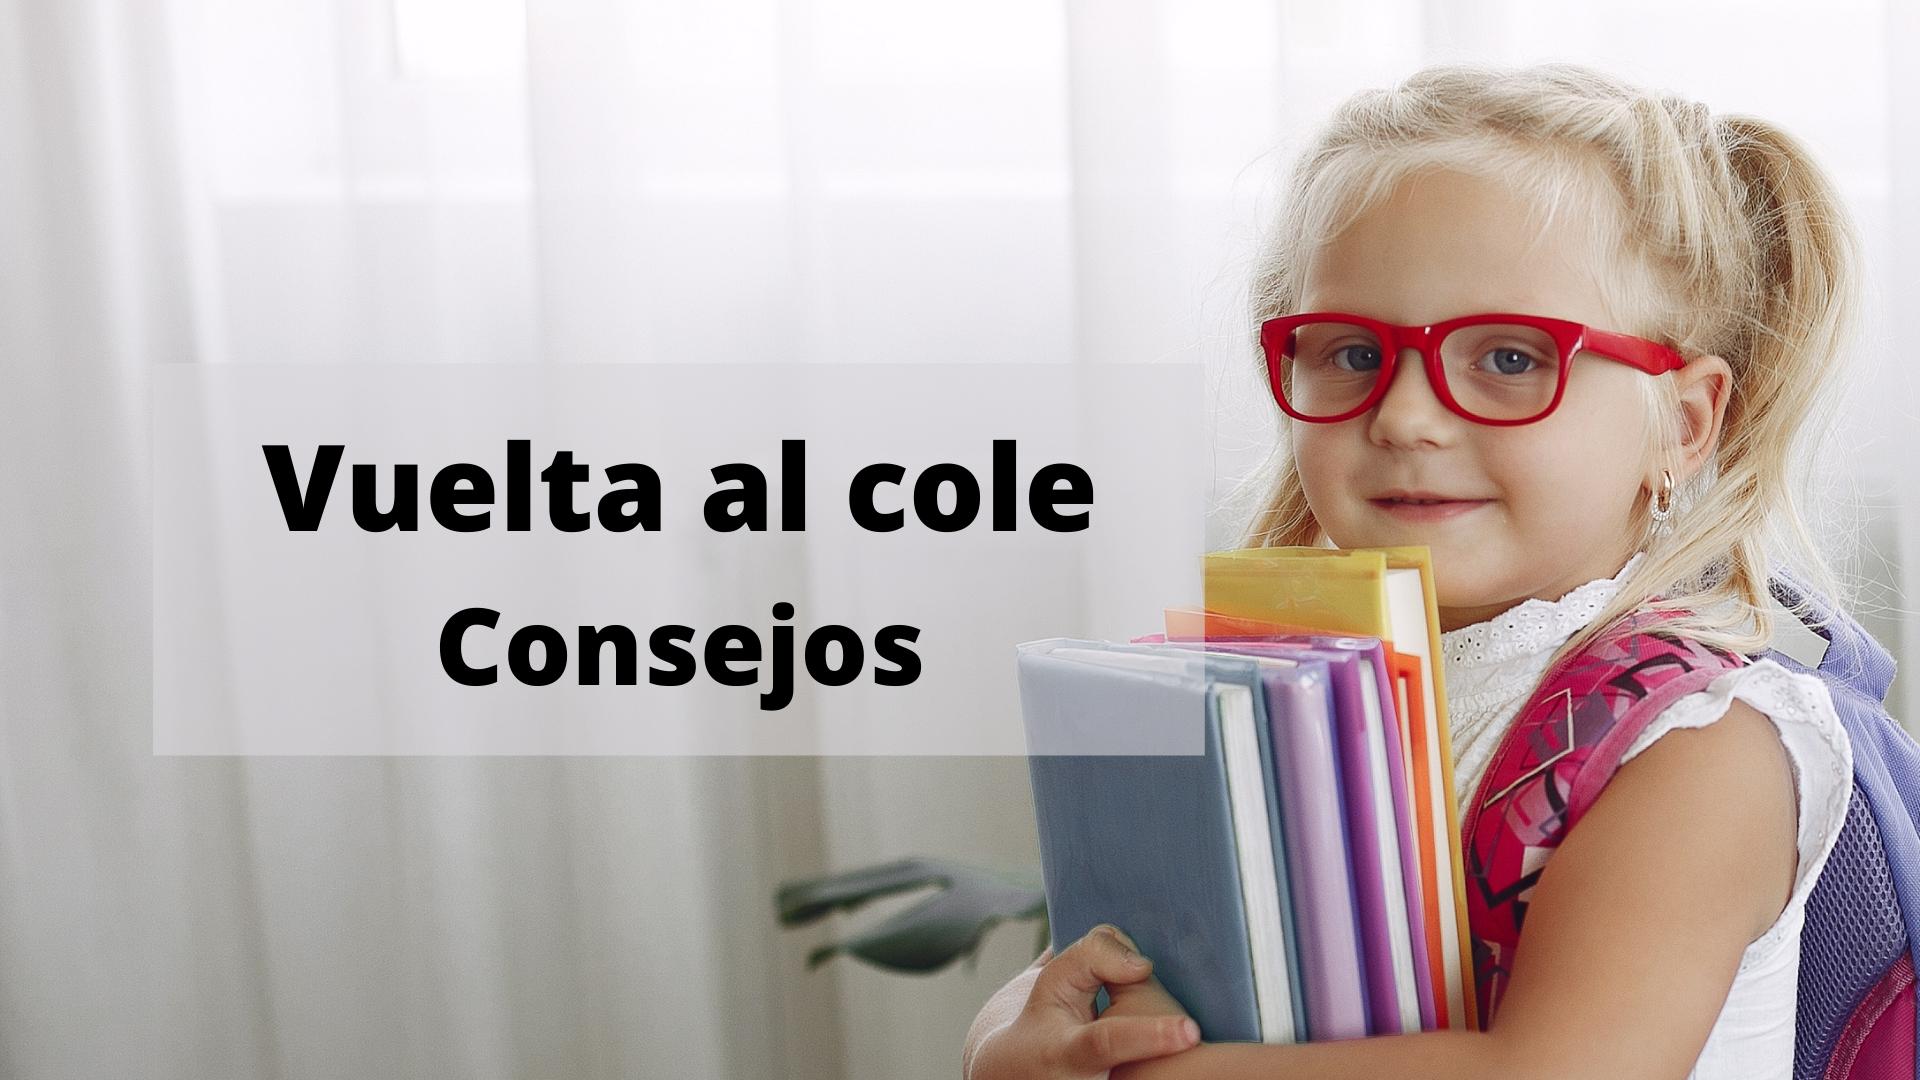 psicologia infantil murcia soma salud bienestar terapia clinica cole colegio escolar